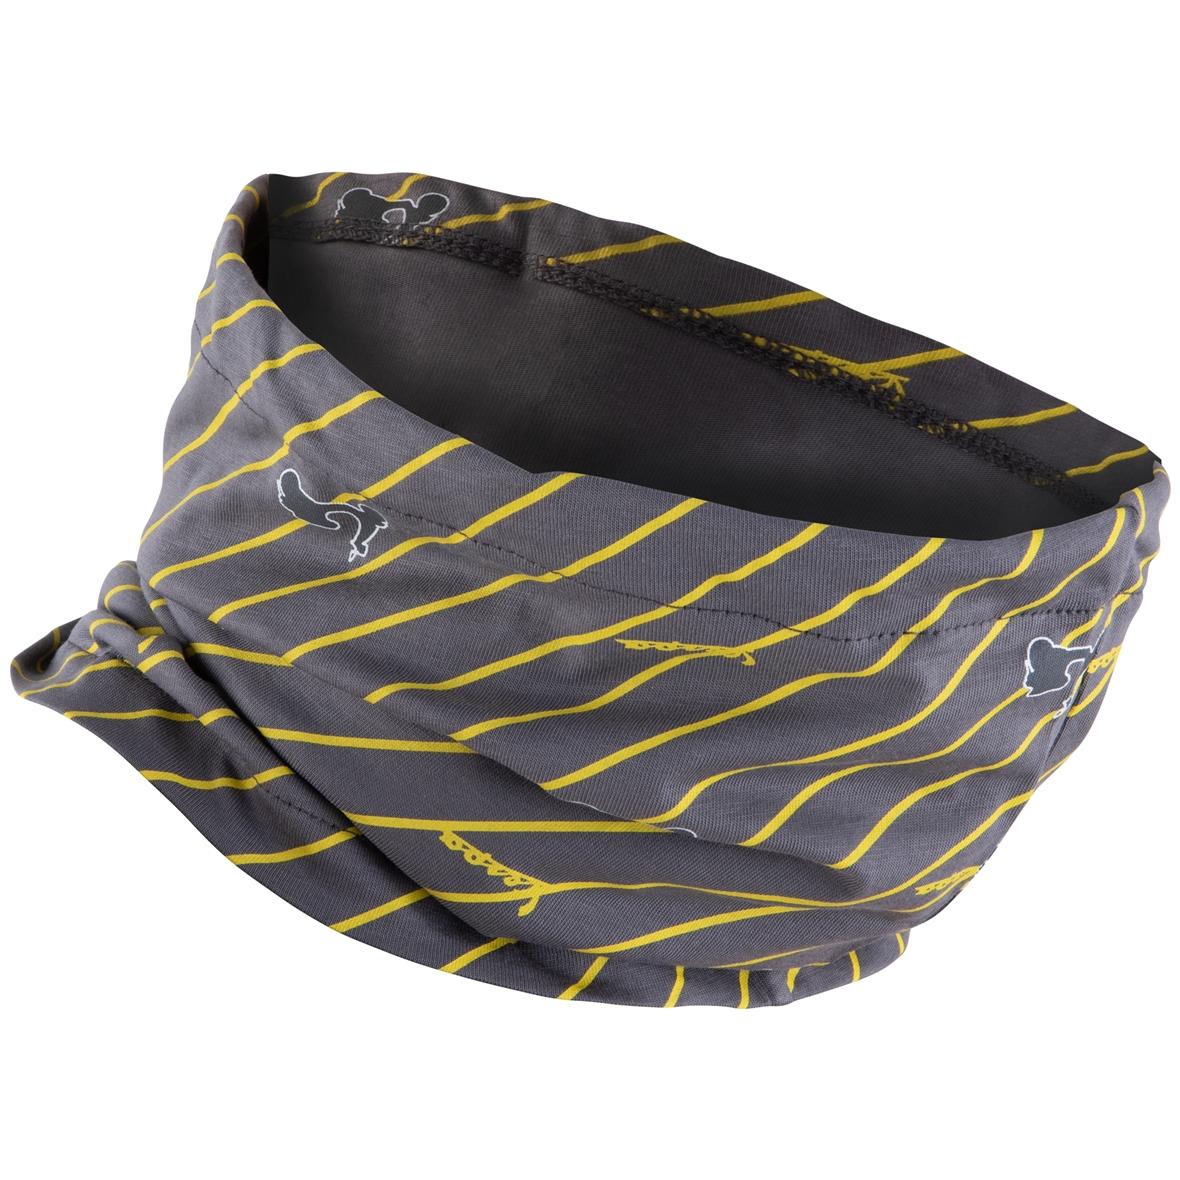 Product Image for 'Neck Scarf / Tube PIAGGIO Vespa size one sizeTitle'